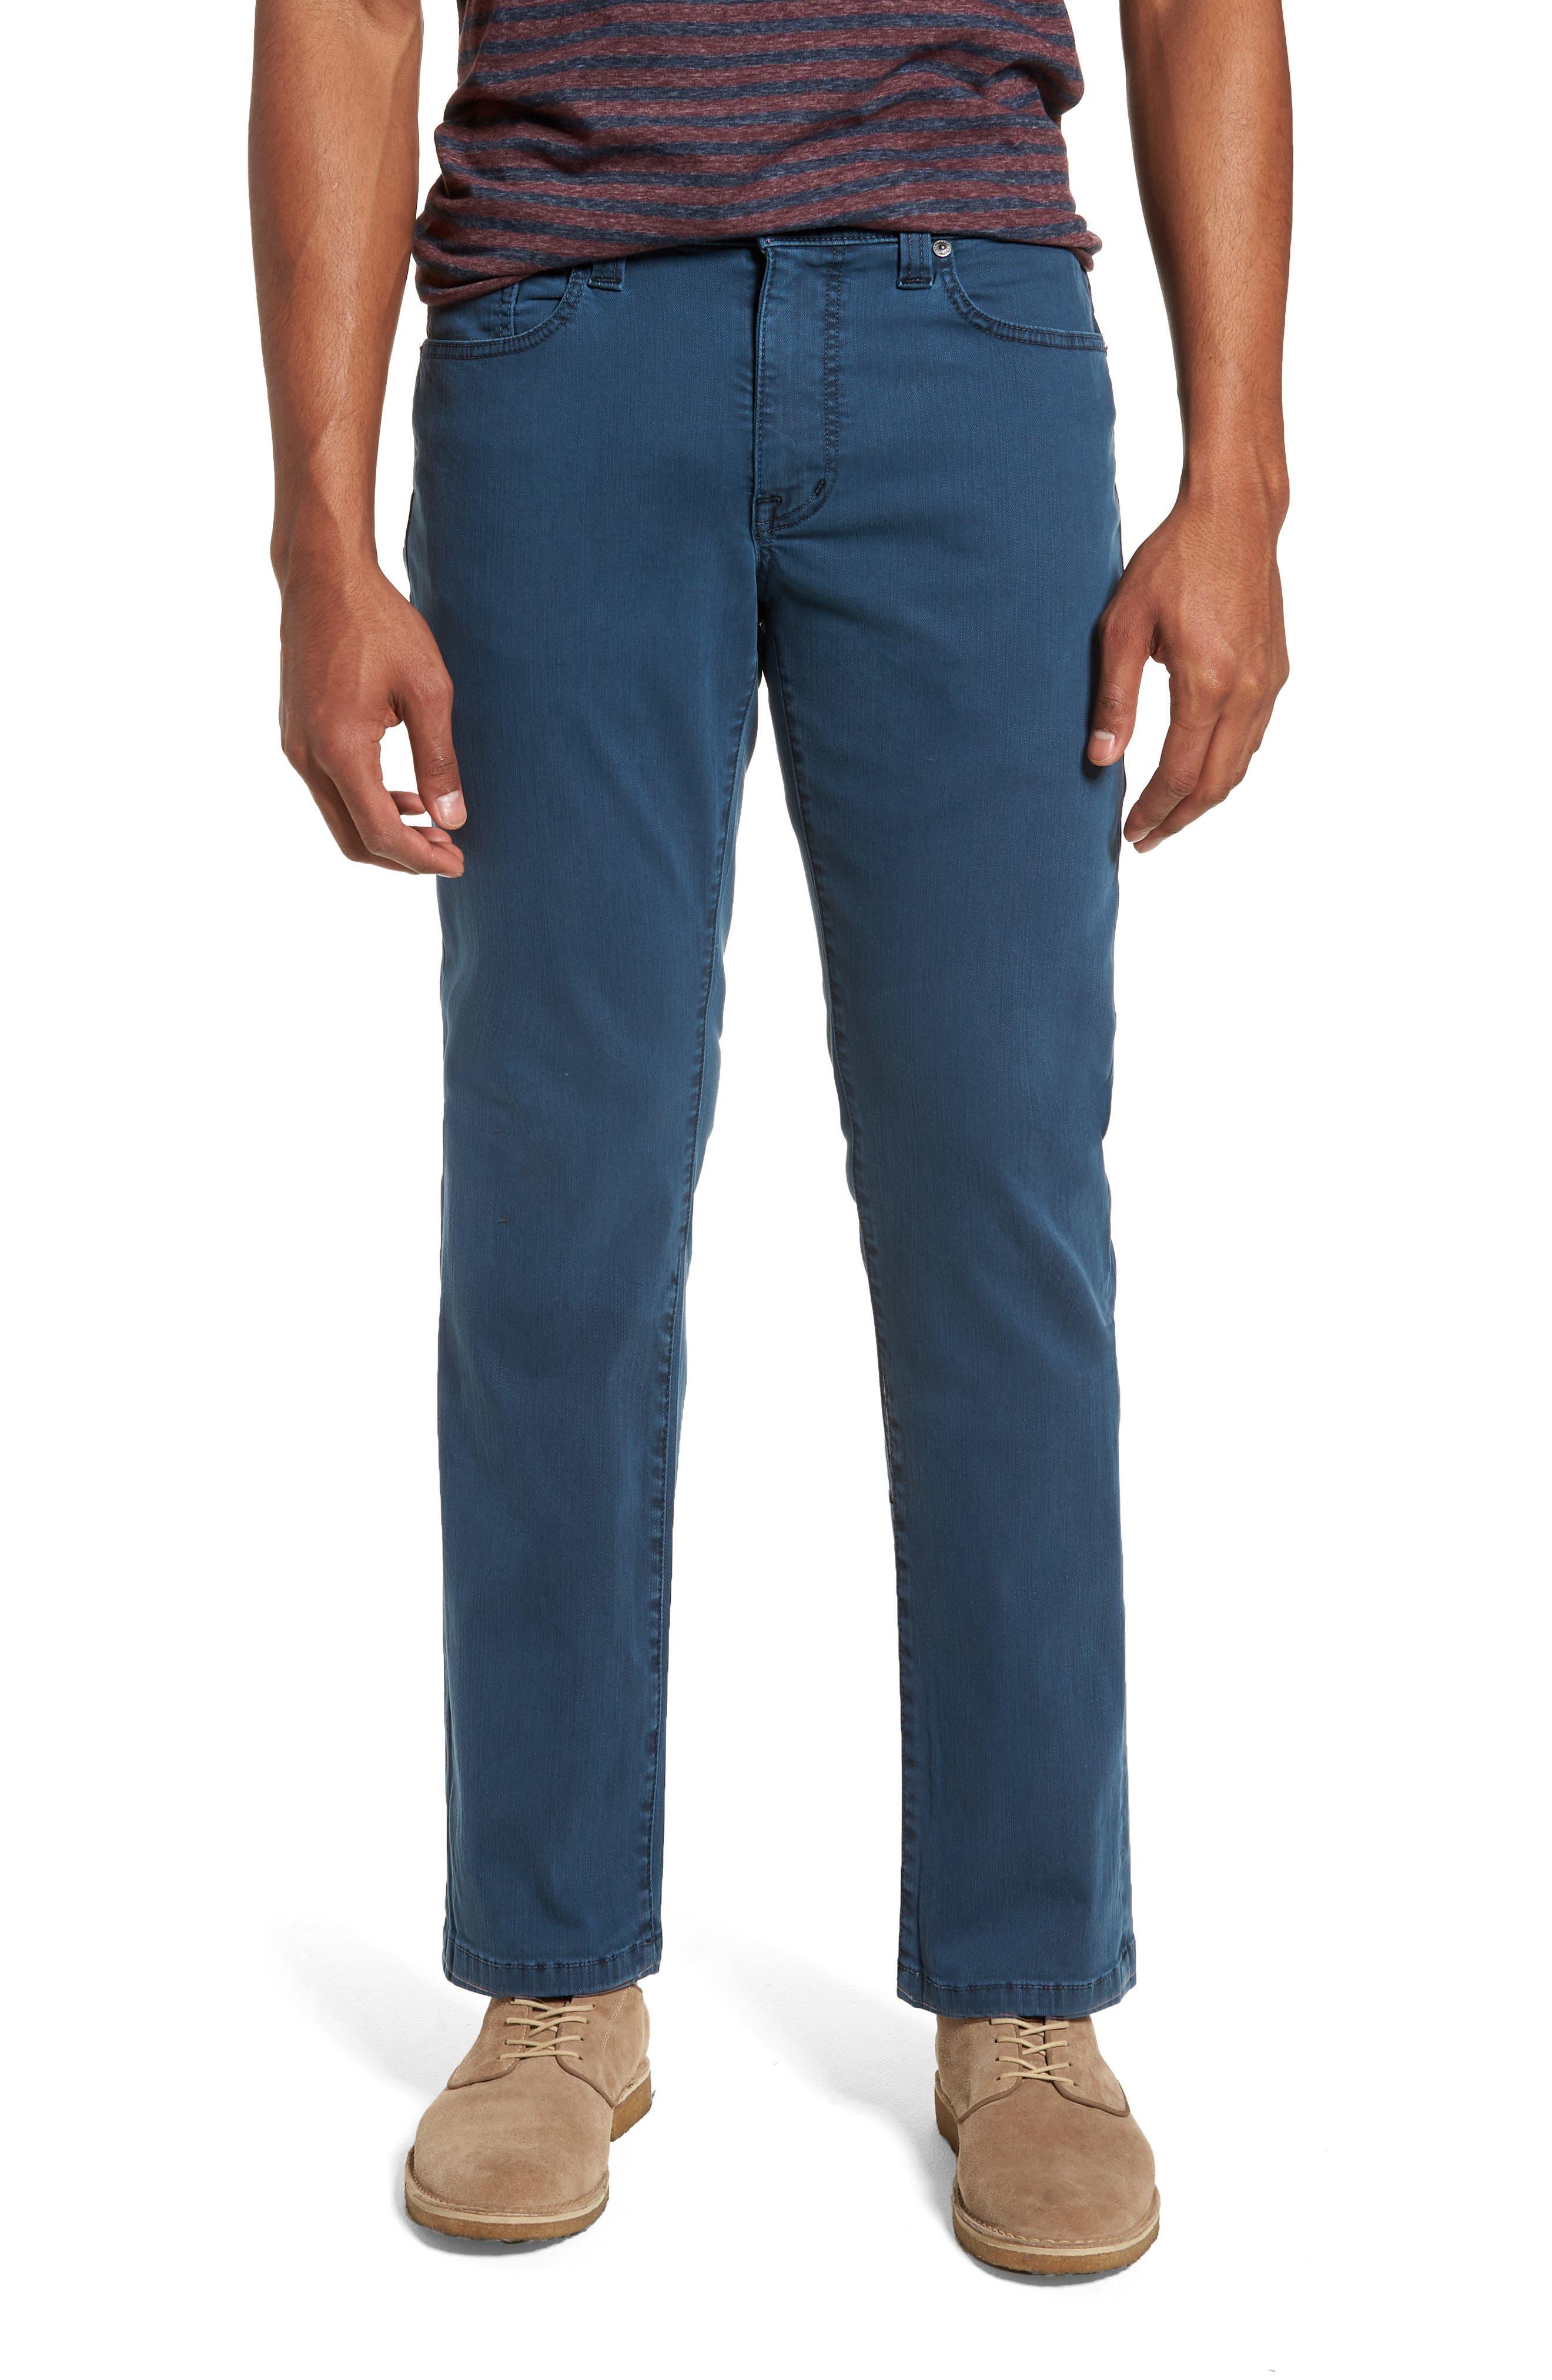 Fidelity Denim Jimmy Slim Straight Leg Jeans (Marina Blue)